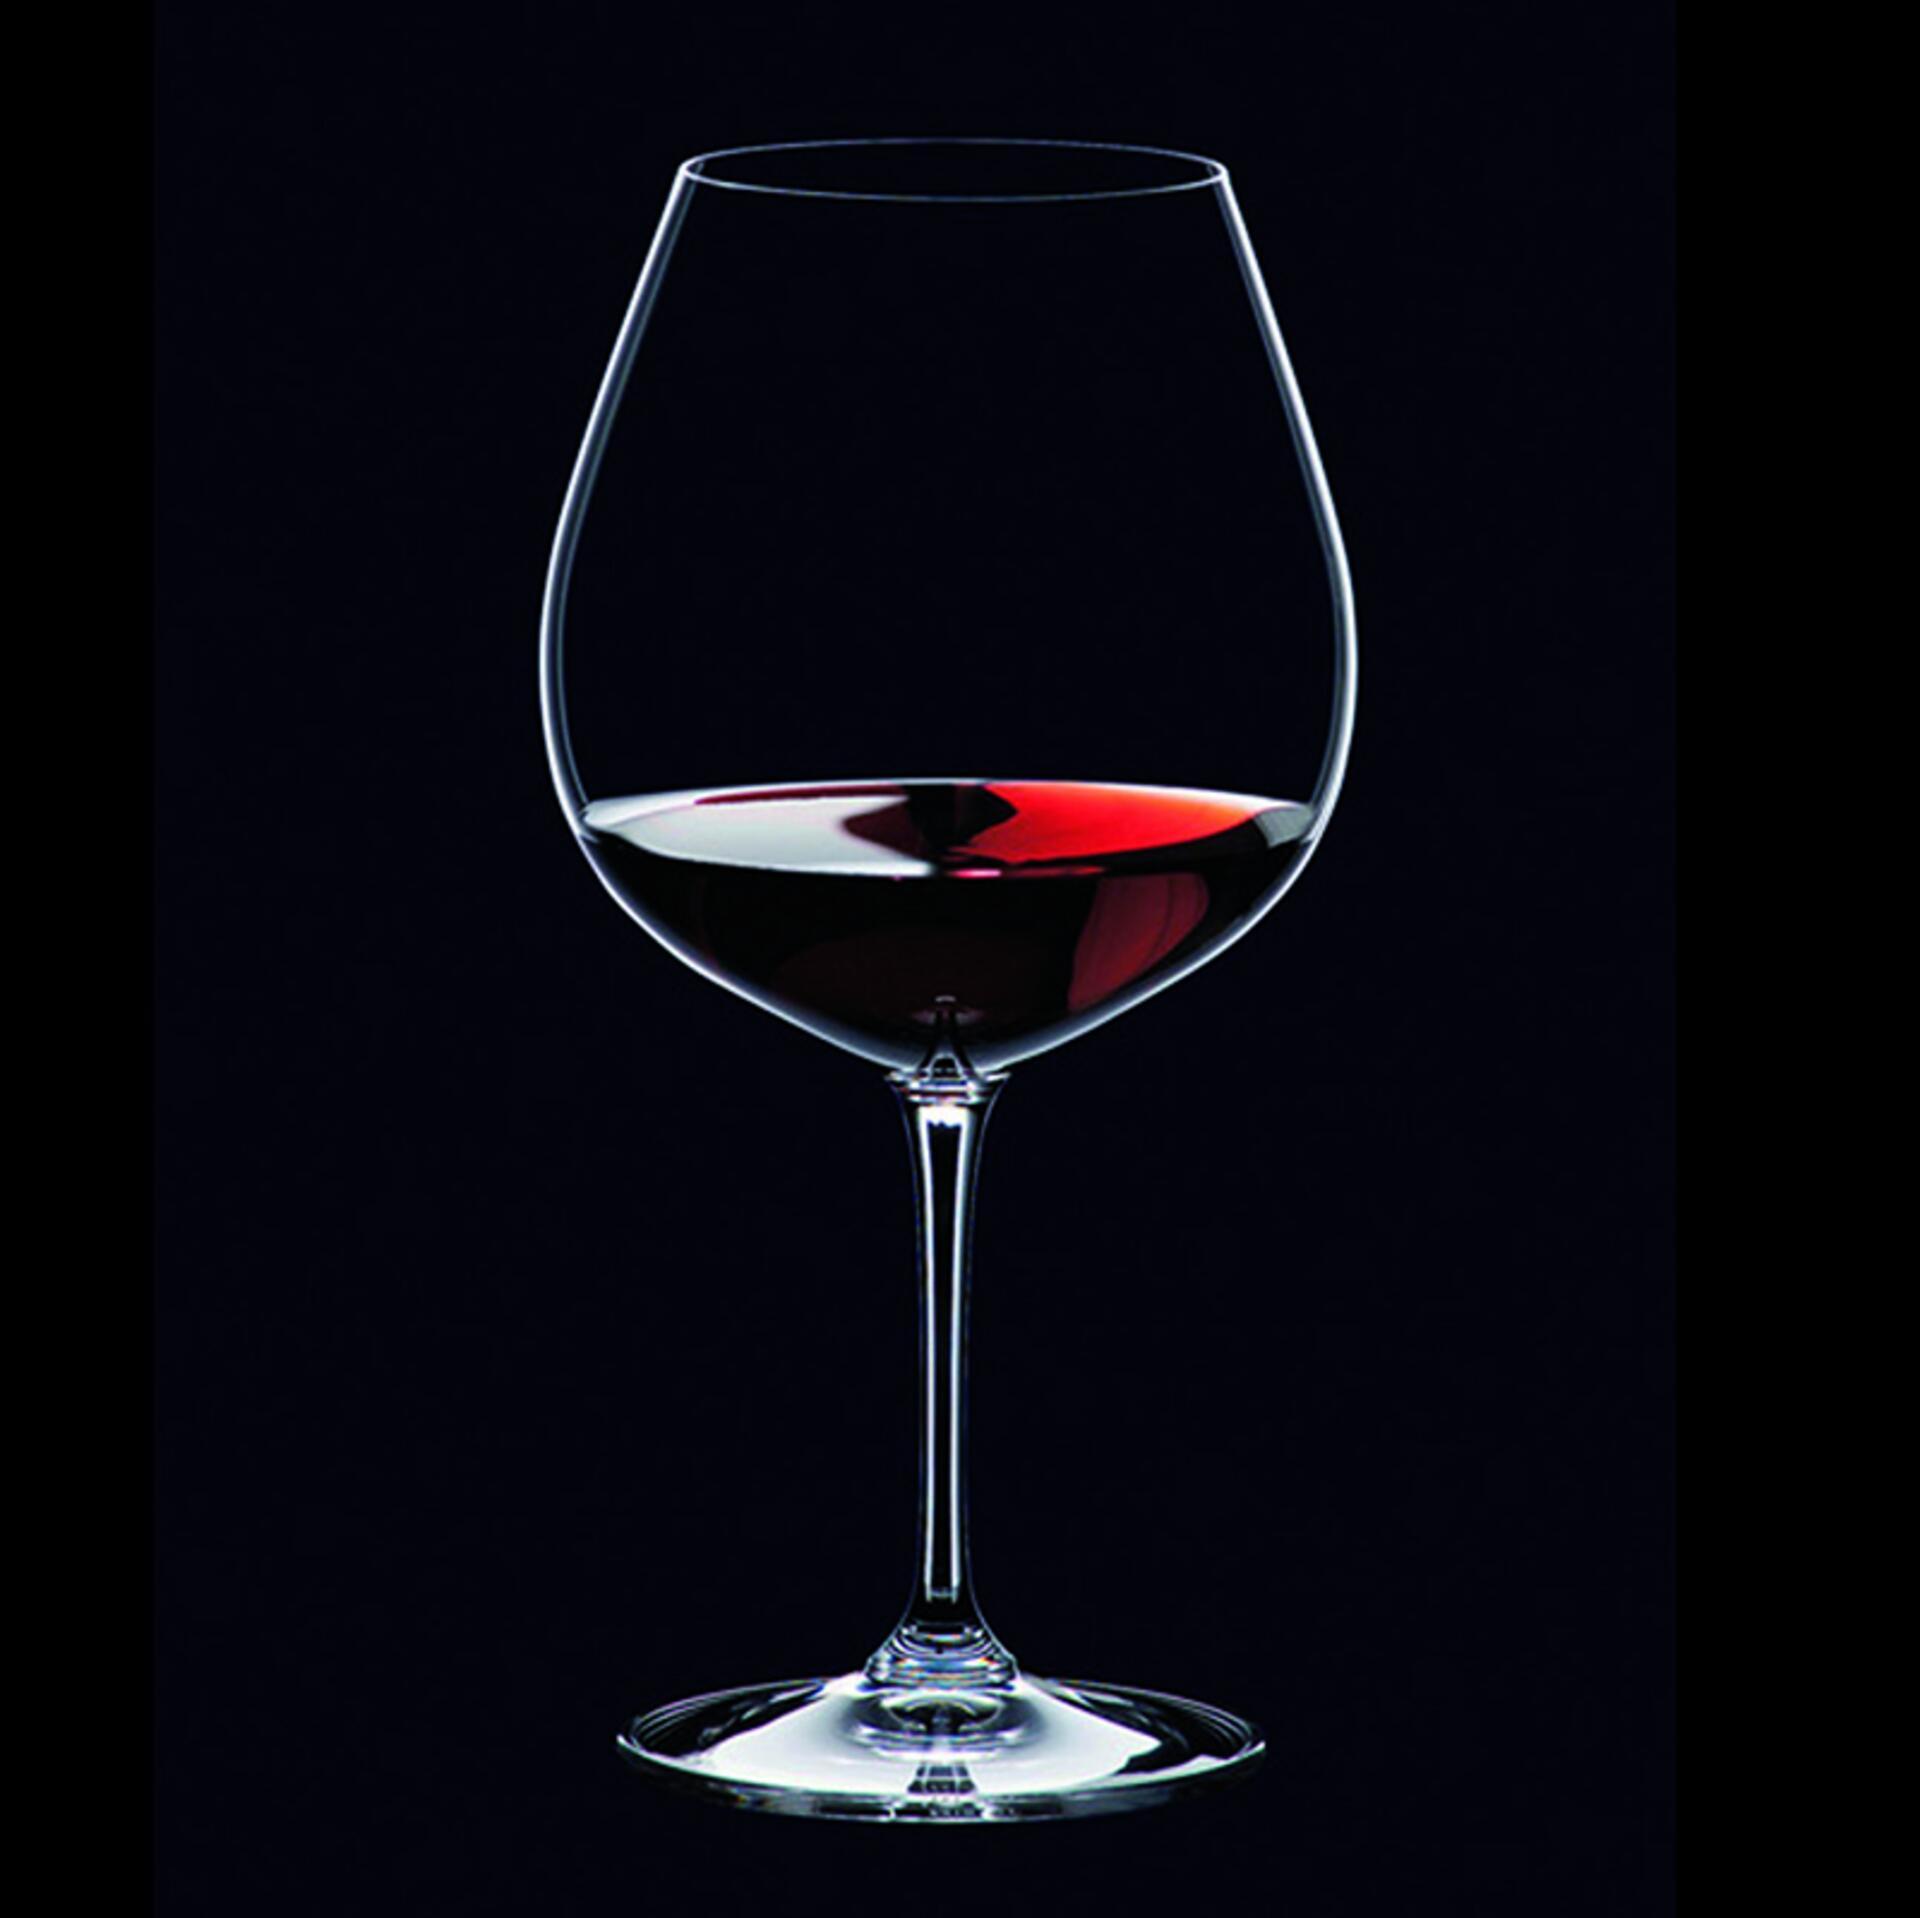 Riedel Vinum Rotweinglas Pinot Noir (Burgunder Rot) 2 Stück 6416/07